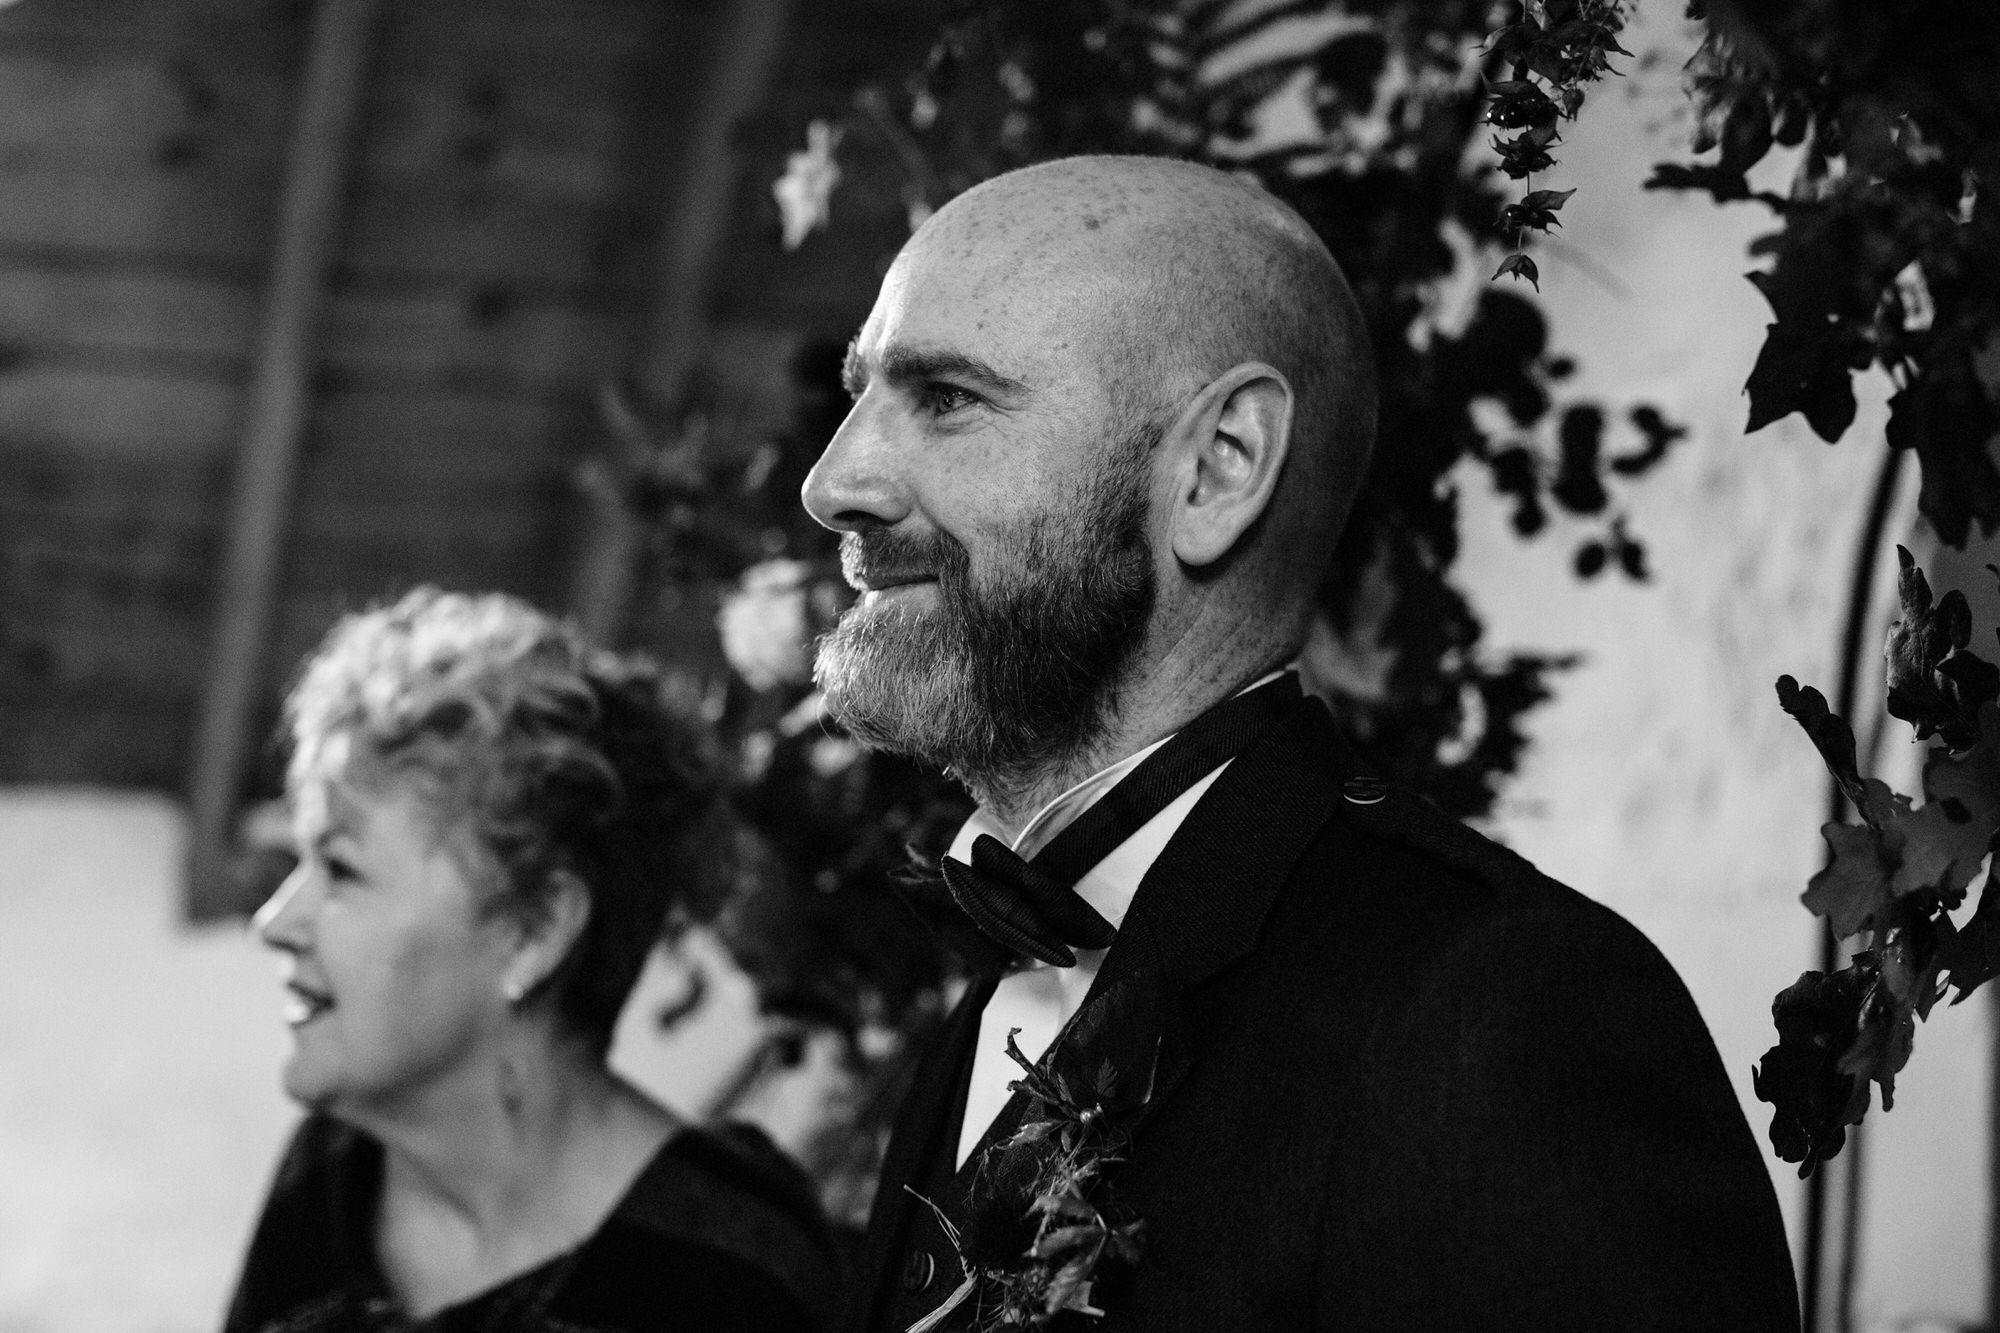 014 TIN SHED KNOCKRAICH WEDDING AUTUMN ZOE ALEXANDRA PHOTOGRAPHY